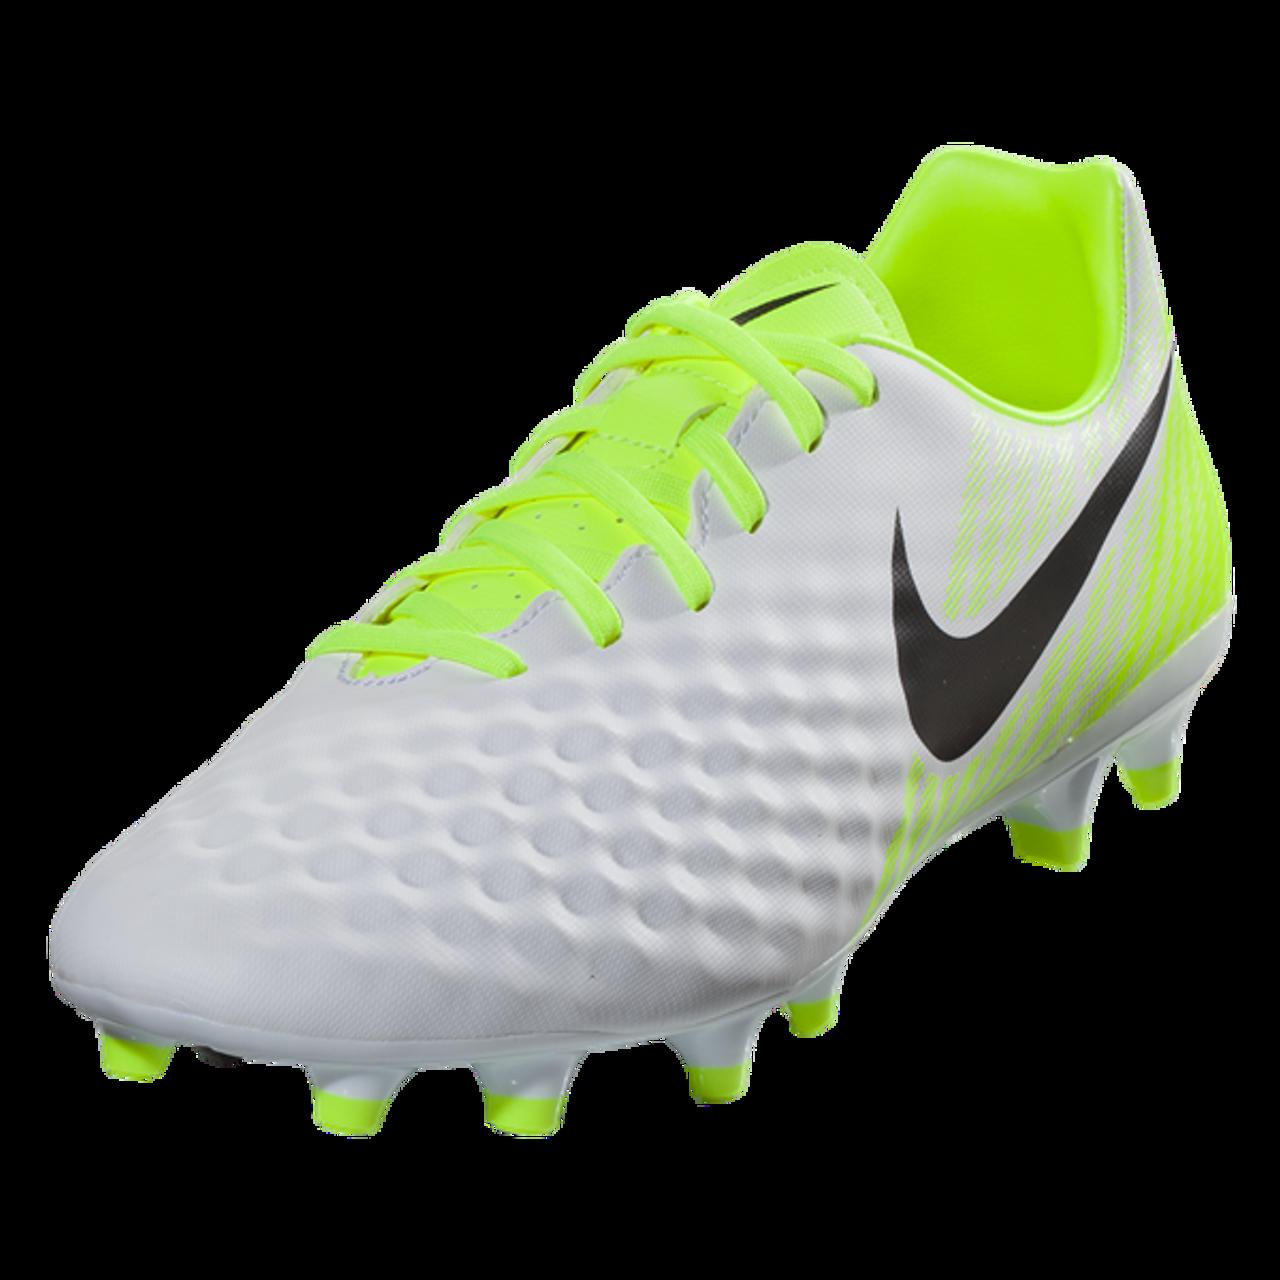 wholesale dealer 92c50 90dd1 Nike Magista Onda II FG - White Black Volt Pure Platinum SD (022619) - ohp  soccer